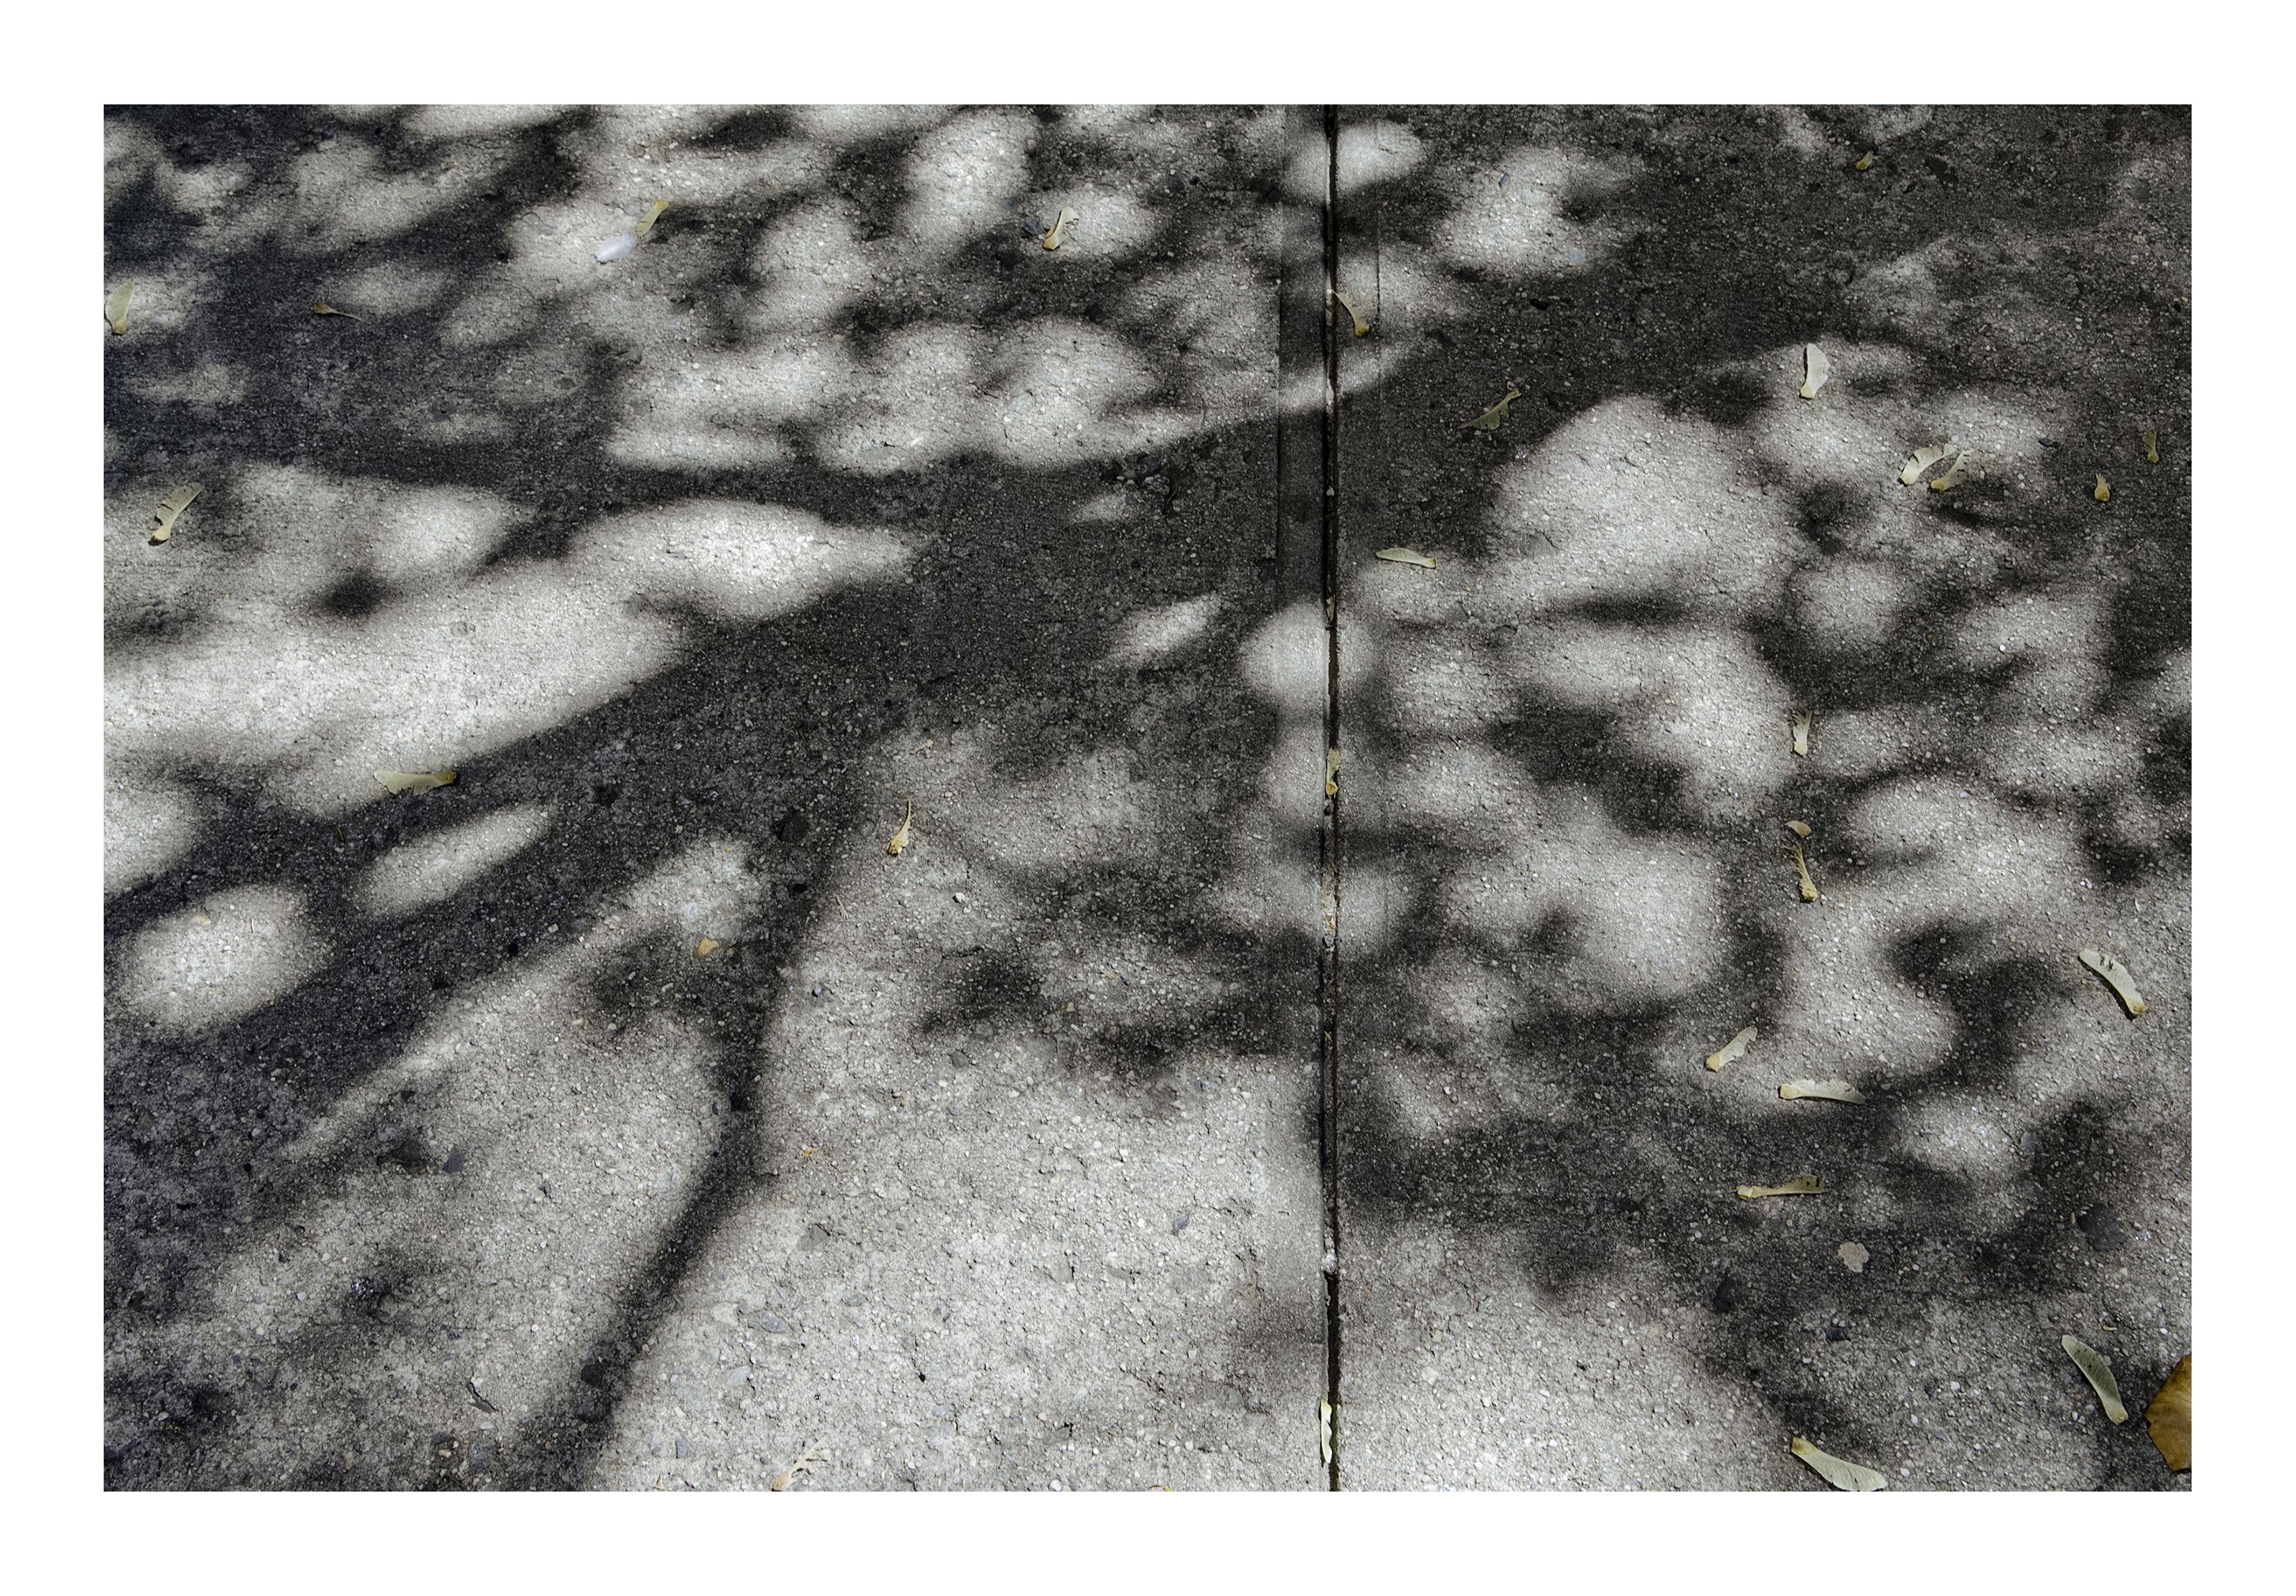 Shadows_385